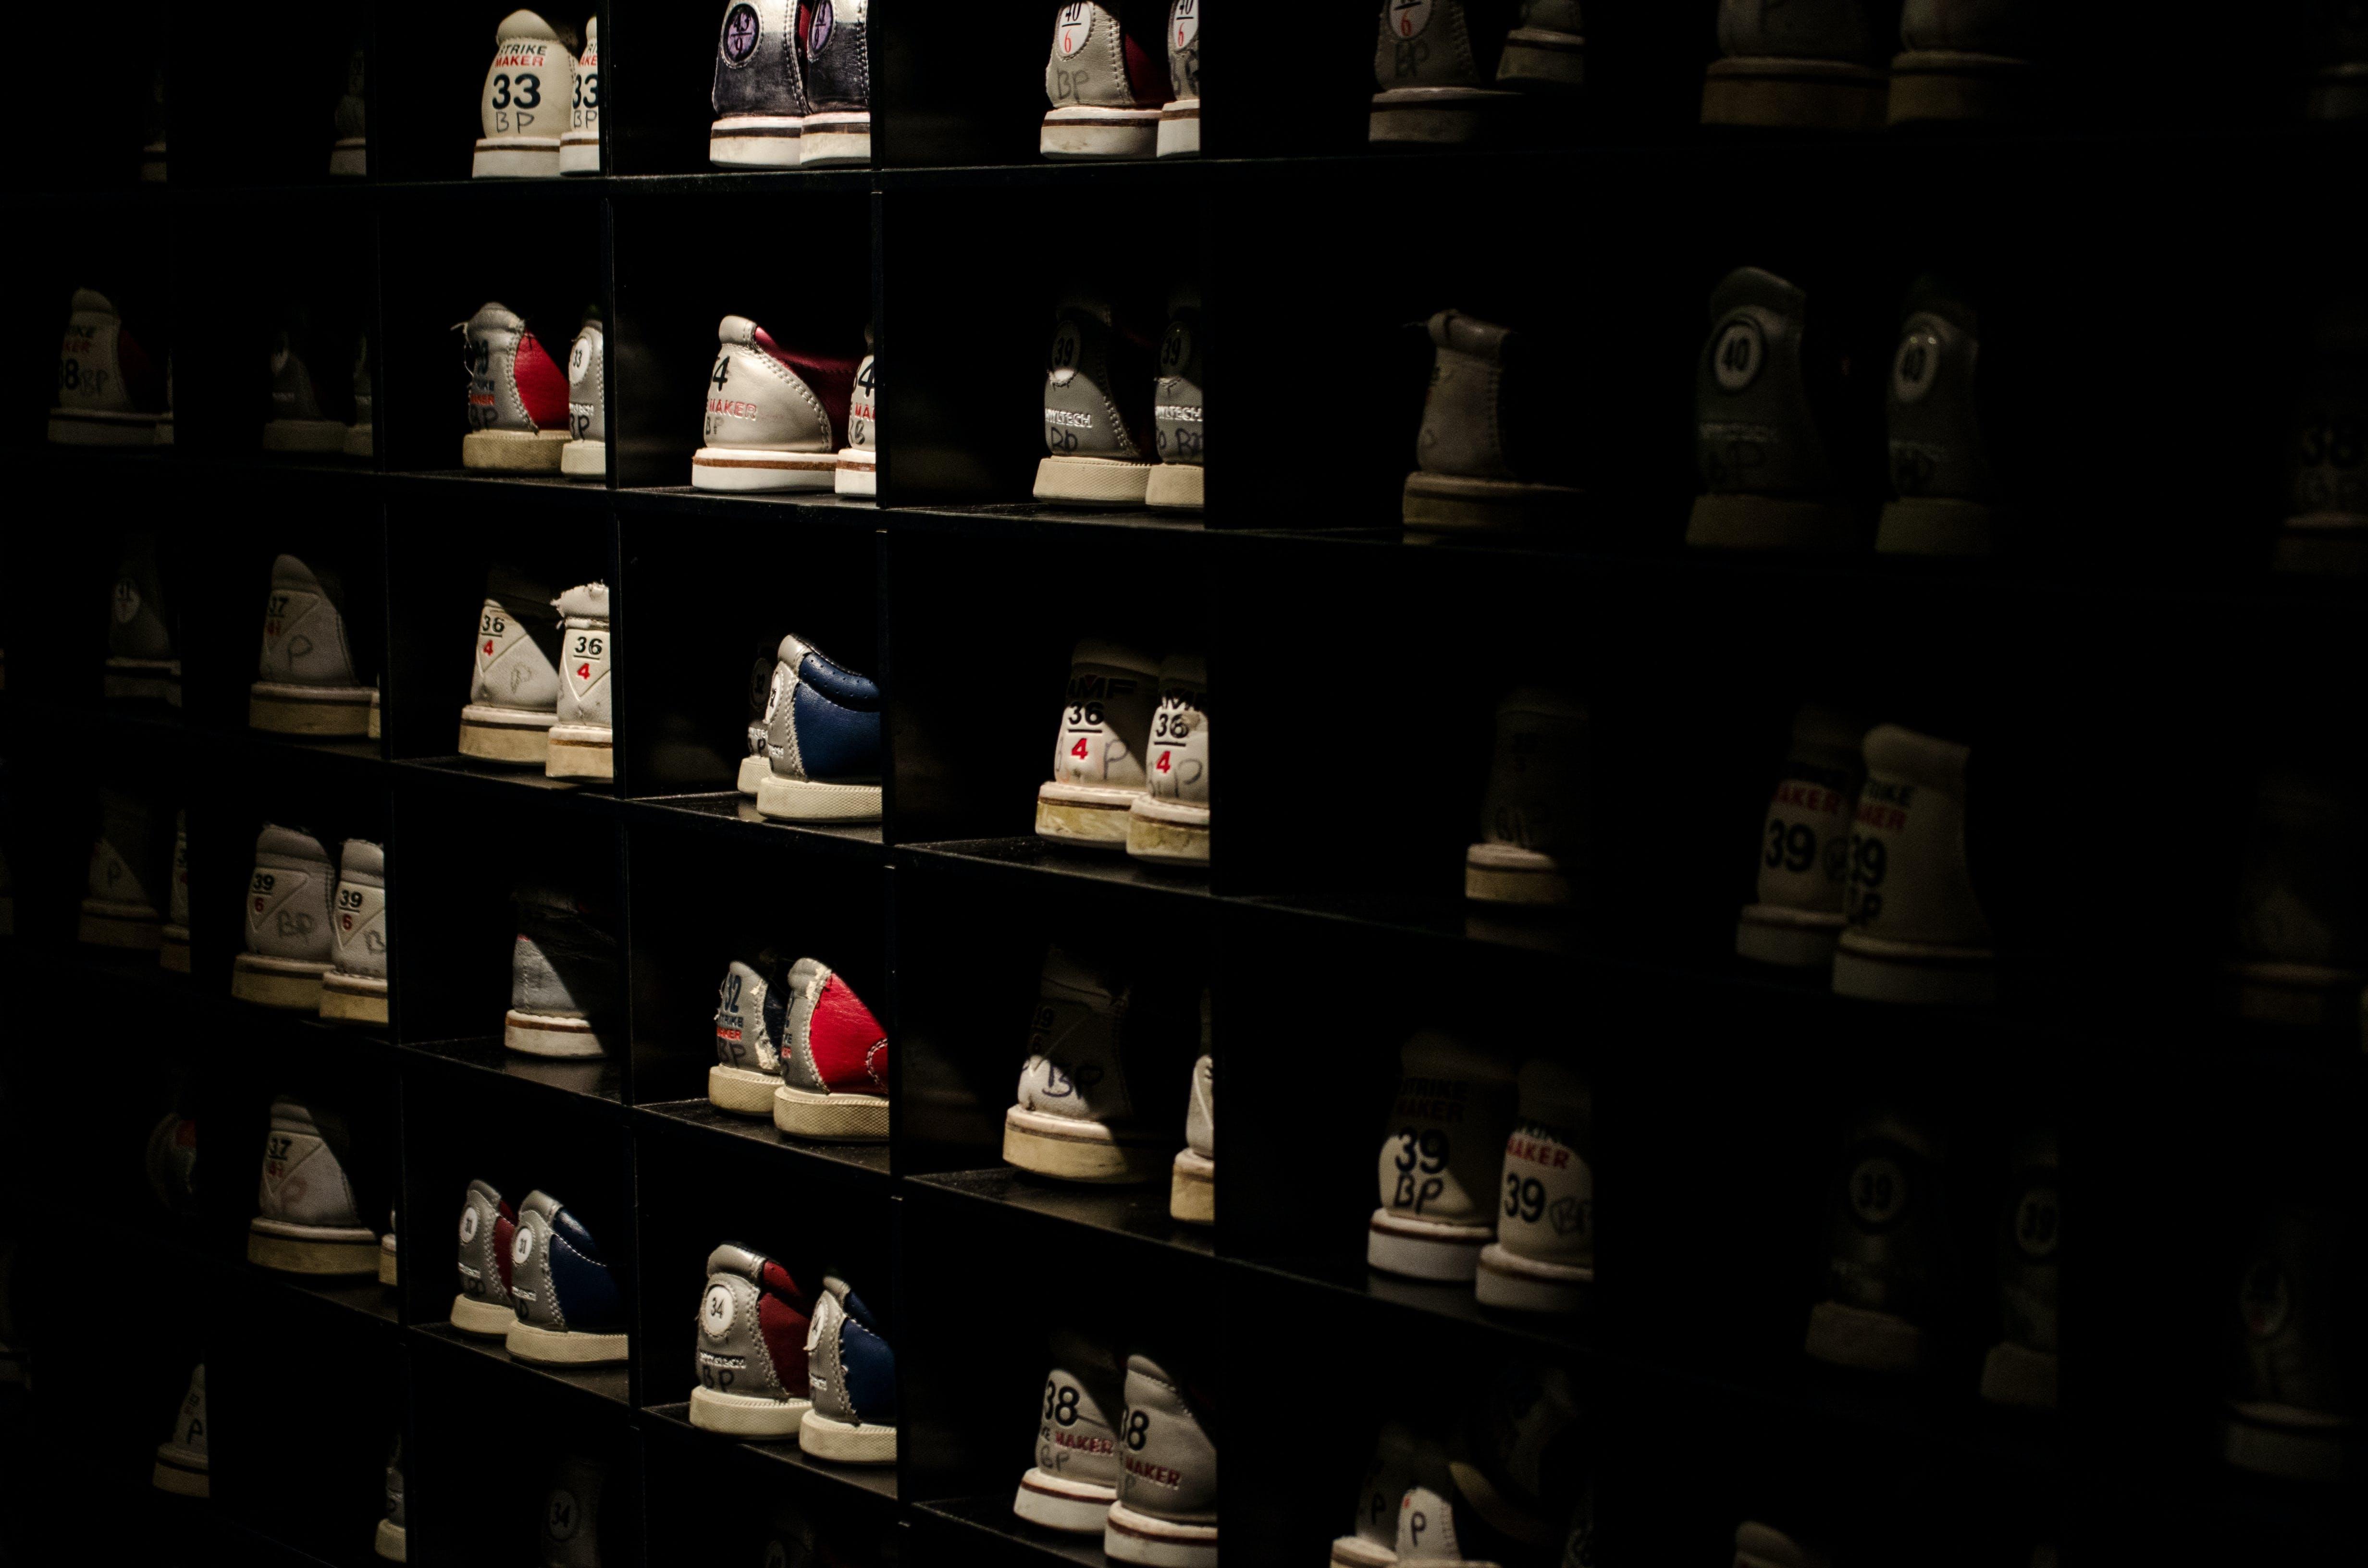 bowlingsko, fodtøj, hylder